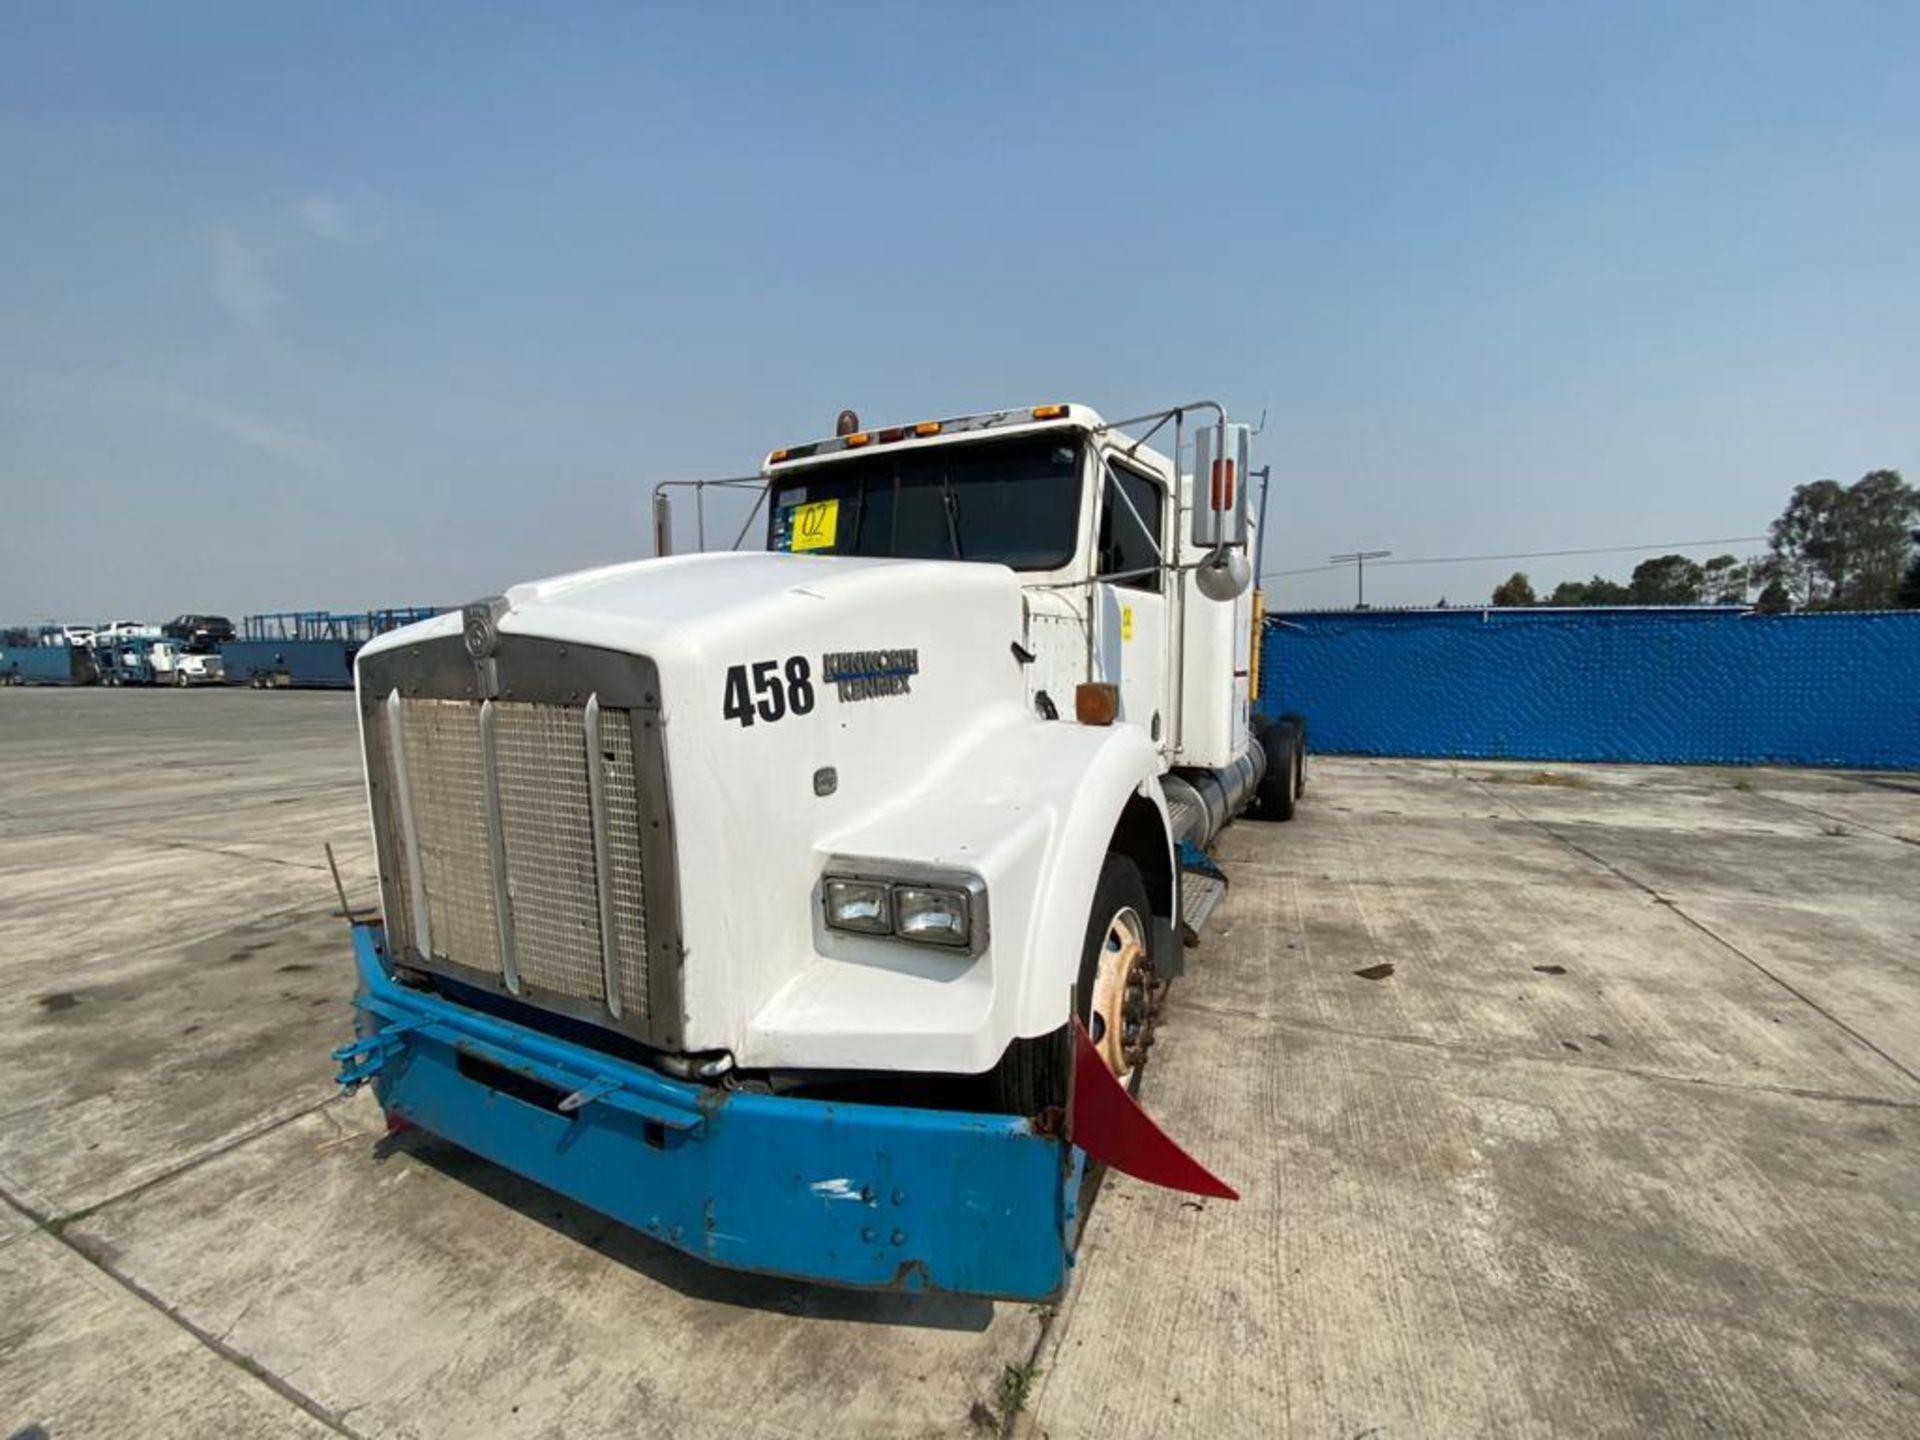 1999 Kenworth Sleeper truck tractor, standard transmission of 18 speeds - Image 8 of 75